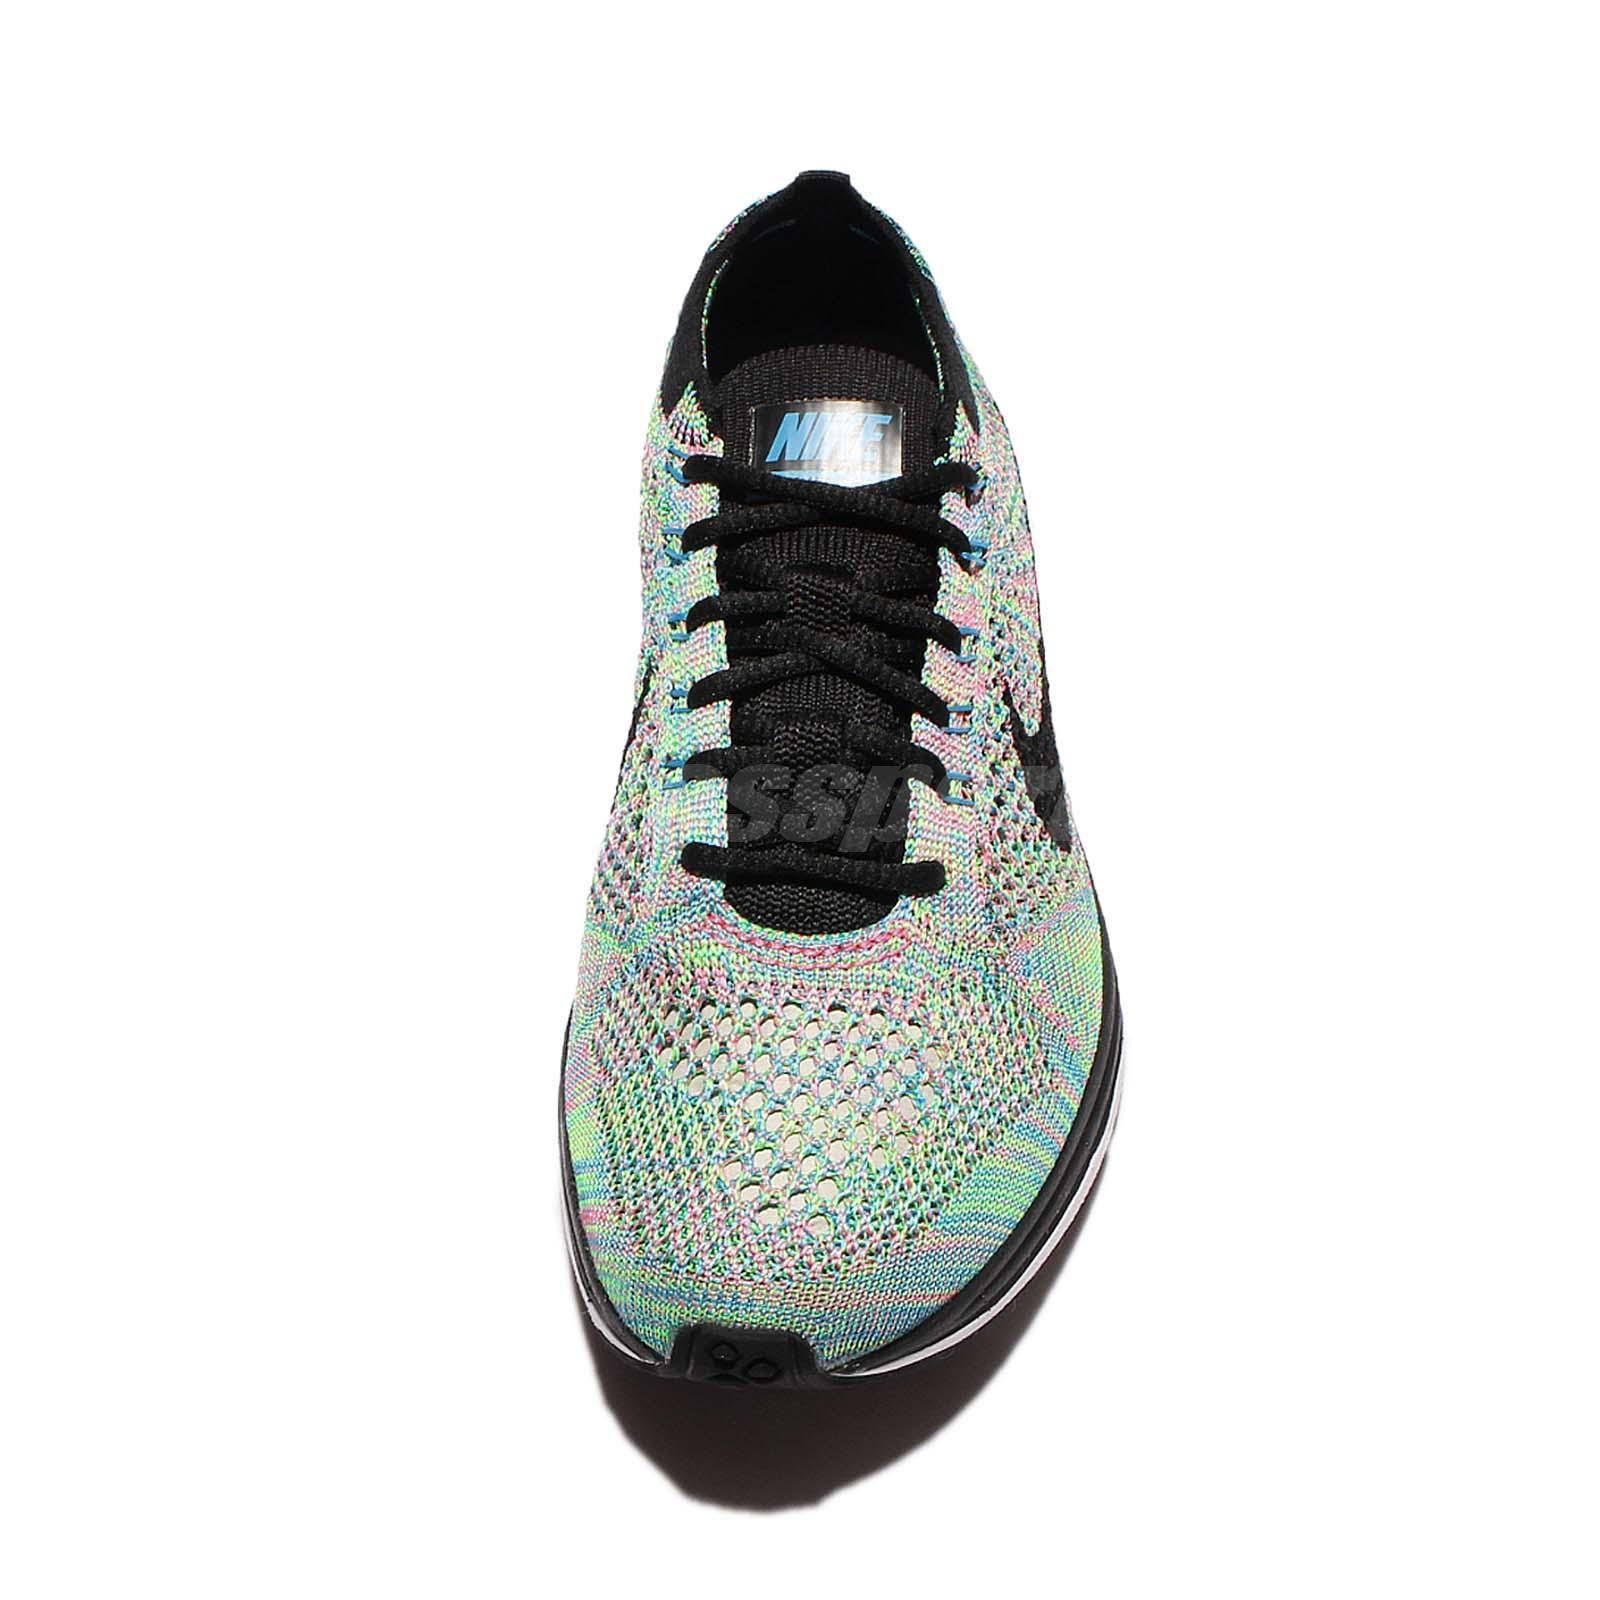 Nike Flyknit Corredor Multicolor 2.0 Ebay Sitio Oficial AAOkblAtZ